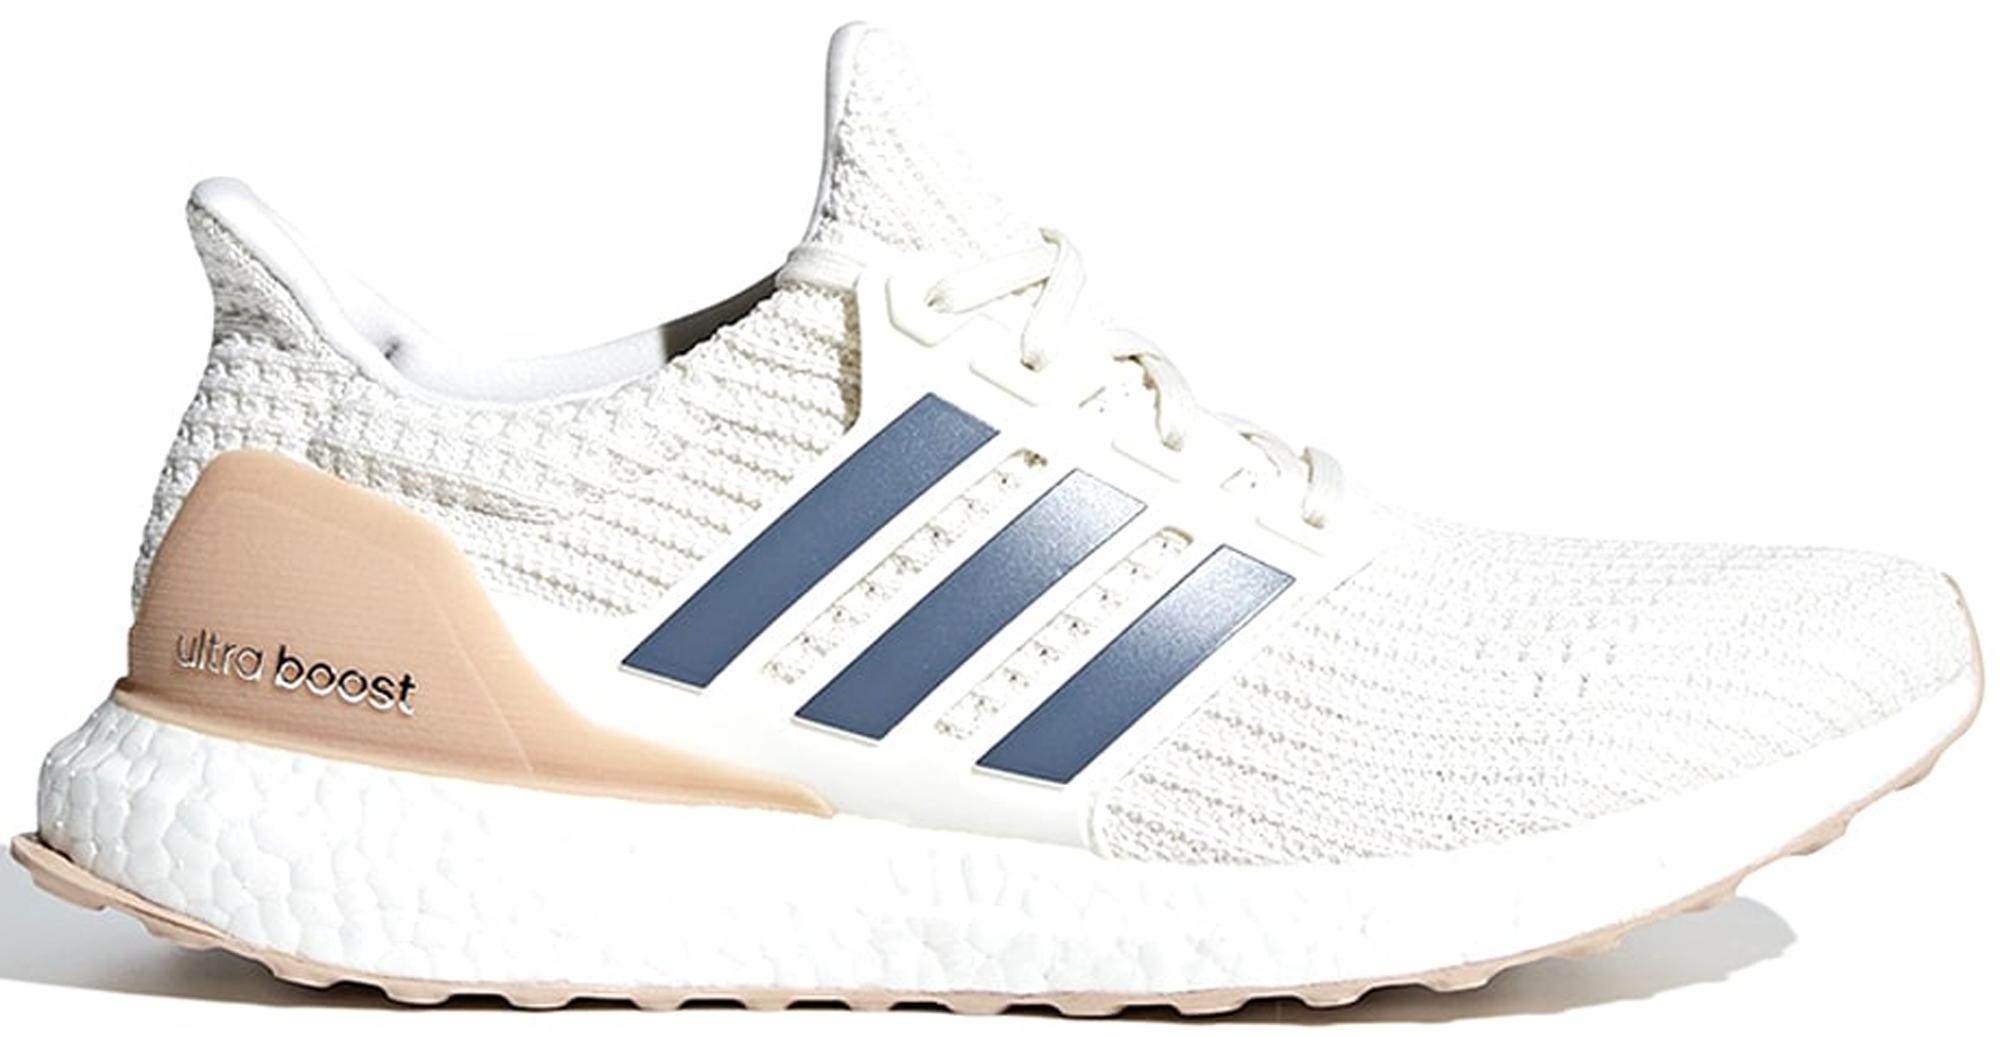 adidas ultra boost 2018 white